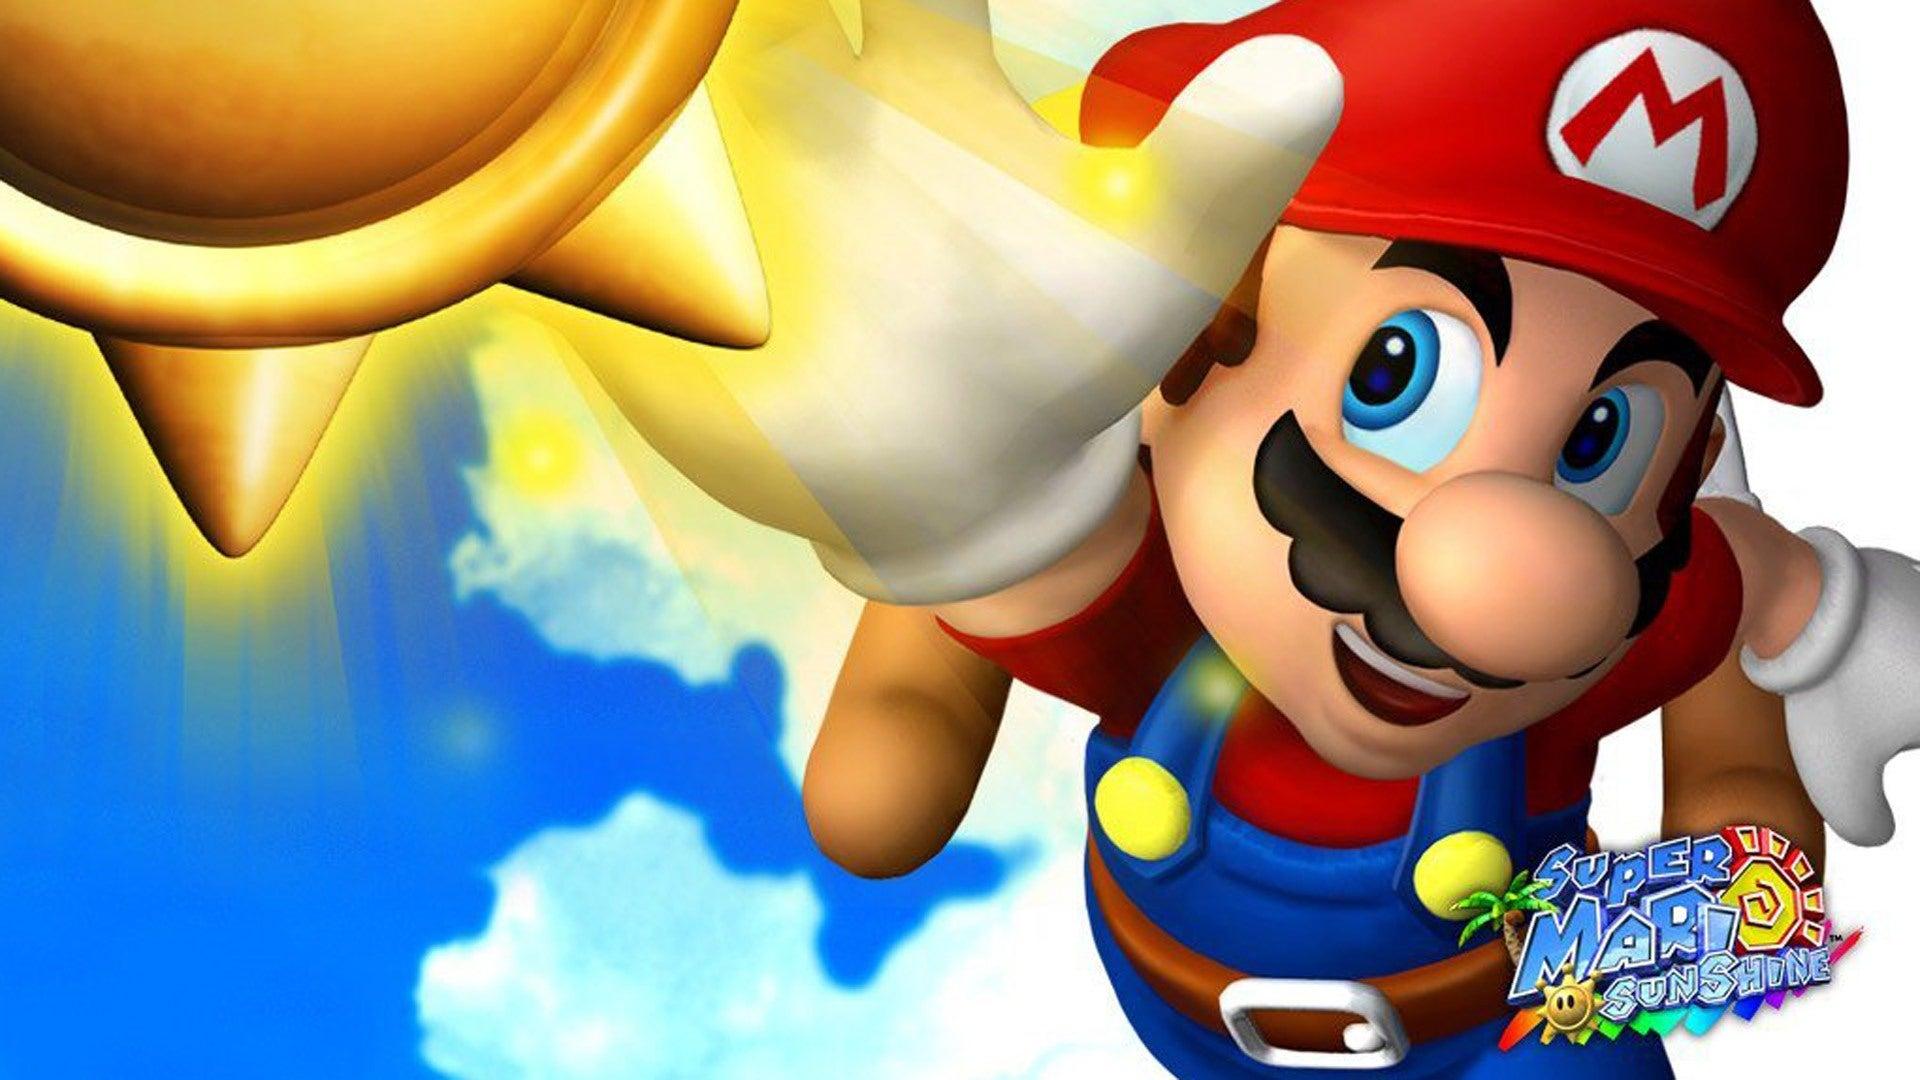 Games Wars Top Super Bros Ten Wii Star Smash